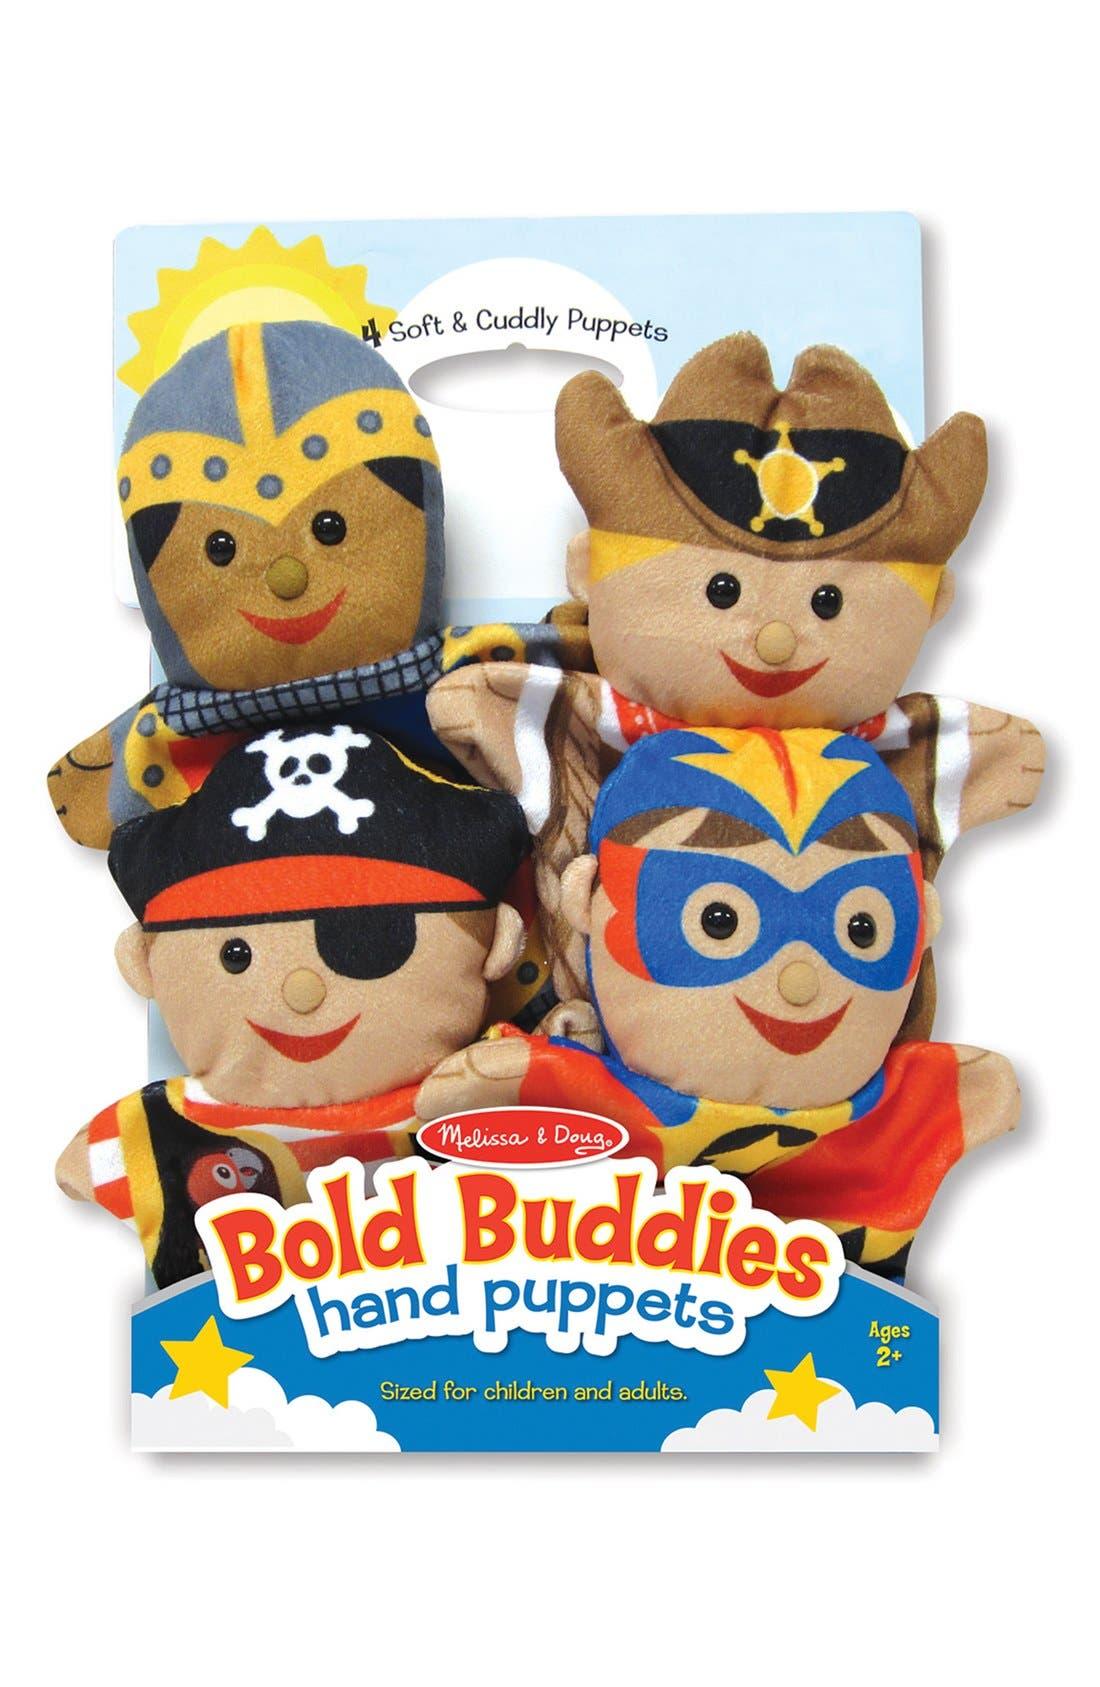 MELISSA & DOUG 'Brave Buddies' Hand Puppets